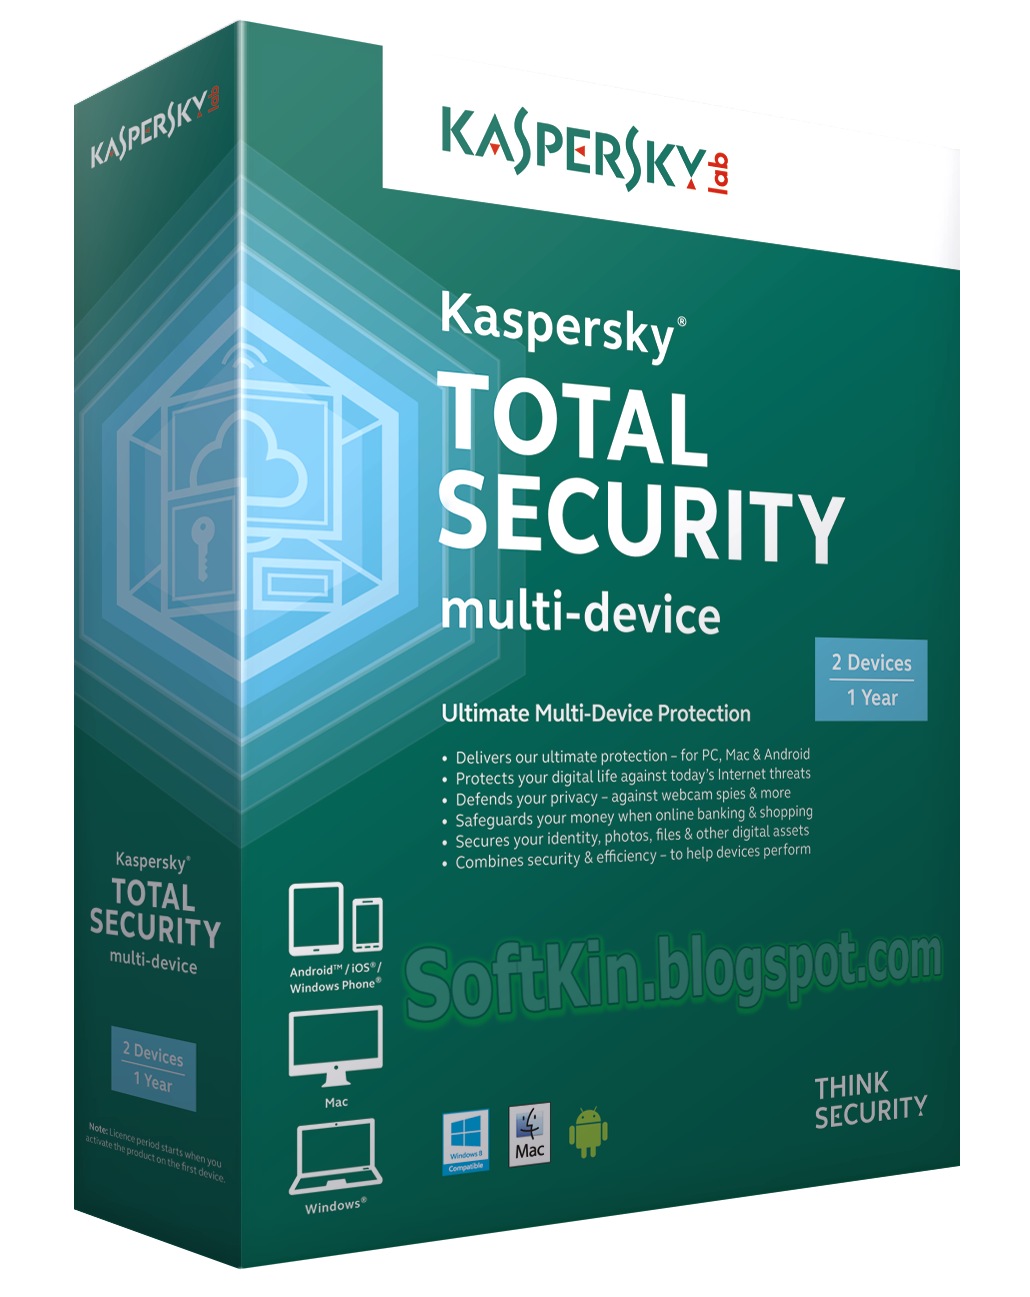 kaspersky internet security download standalone